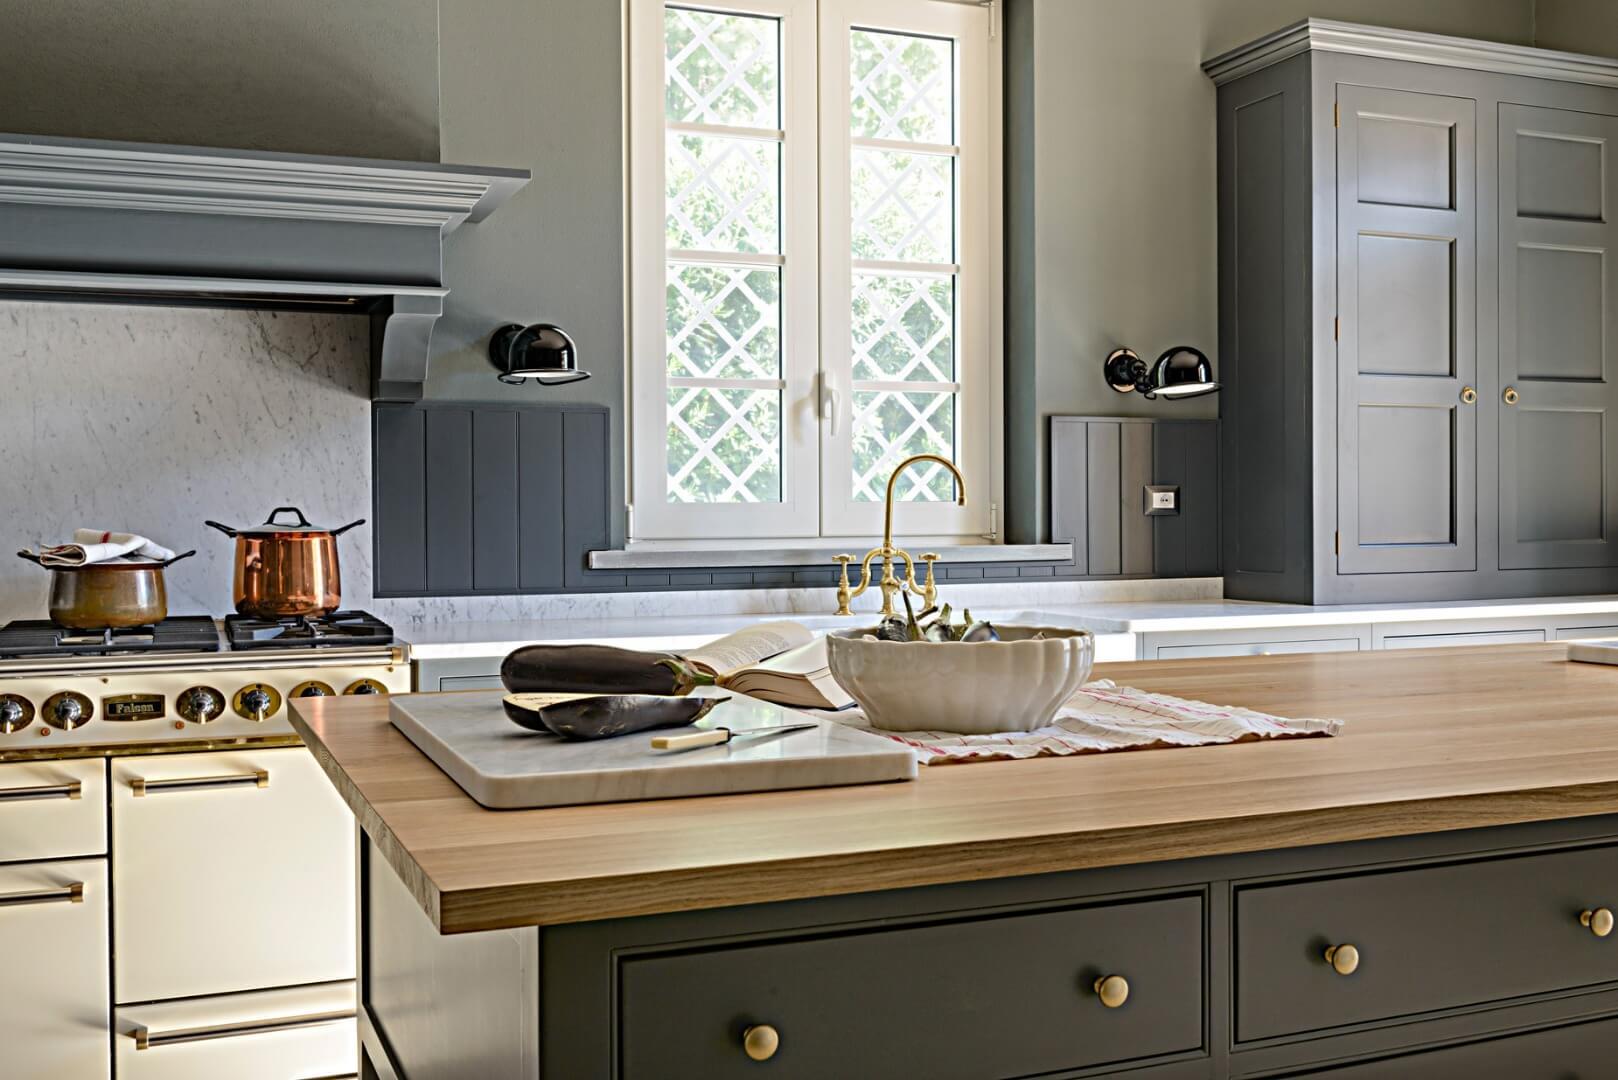 Top Cucina Stile Inglese Ideas - Comads897.com - comads897.com